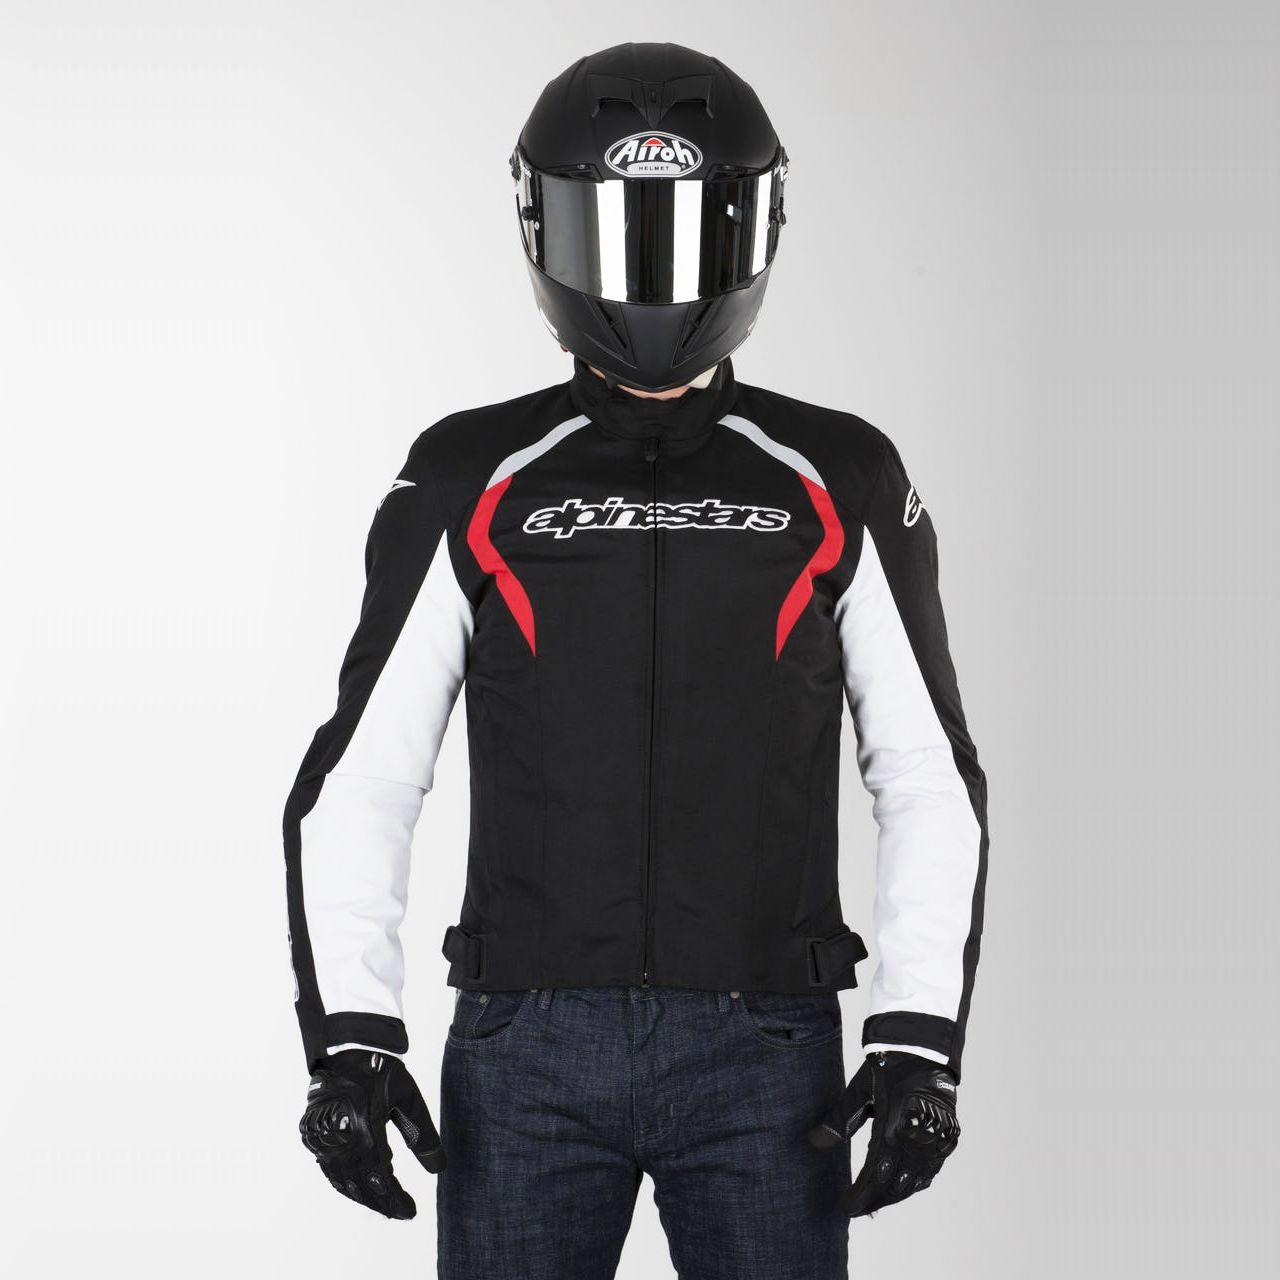 0Jaqueta Alpinestars Fastback WP (Tricolor/ Impermeável)  - Super Bike - Loja Oficial Alpinestars